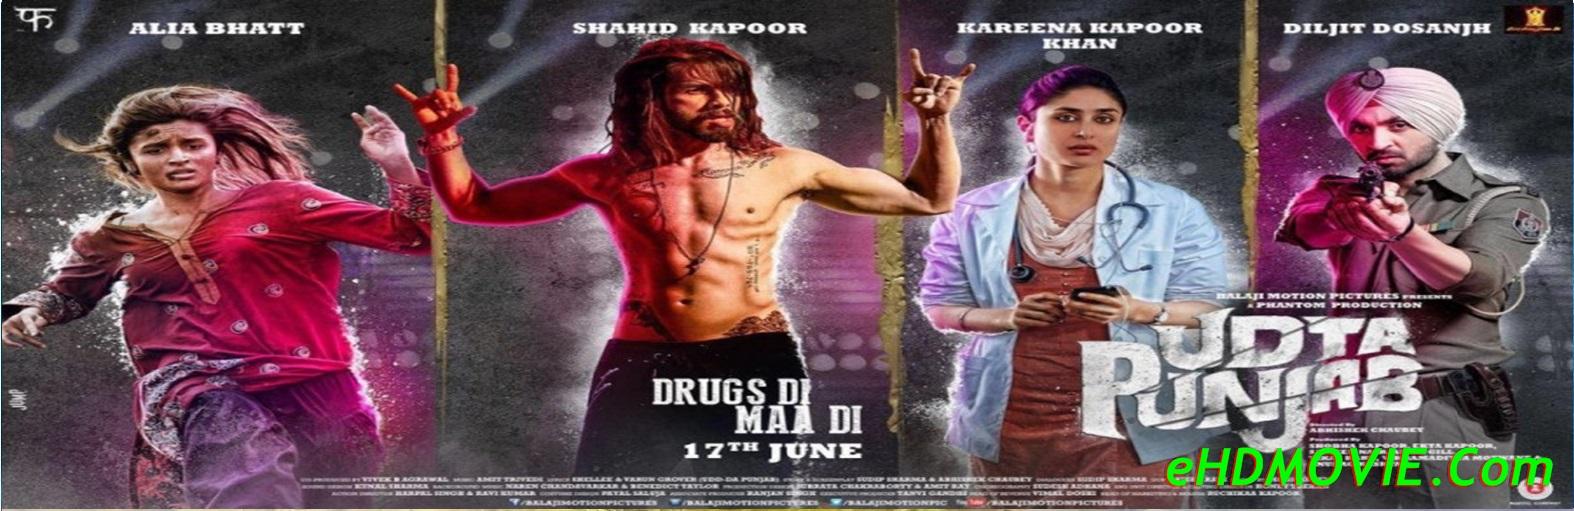 Udta Punjab 2016 Full Movie Hindi 720p - 480p ORG BRRip 550MB - 1.4GB ESubs Free Download